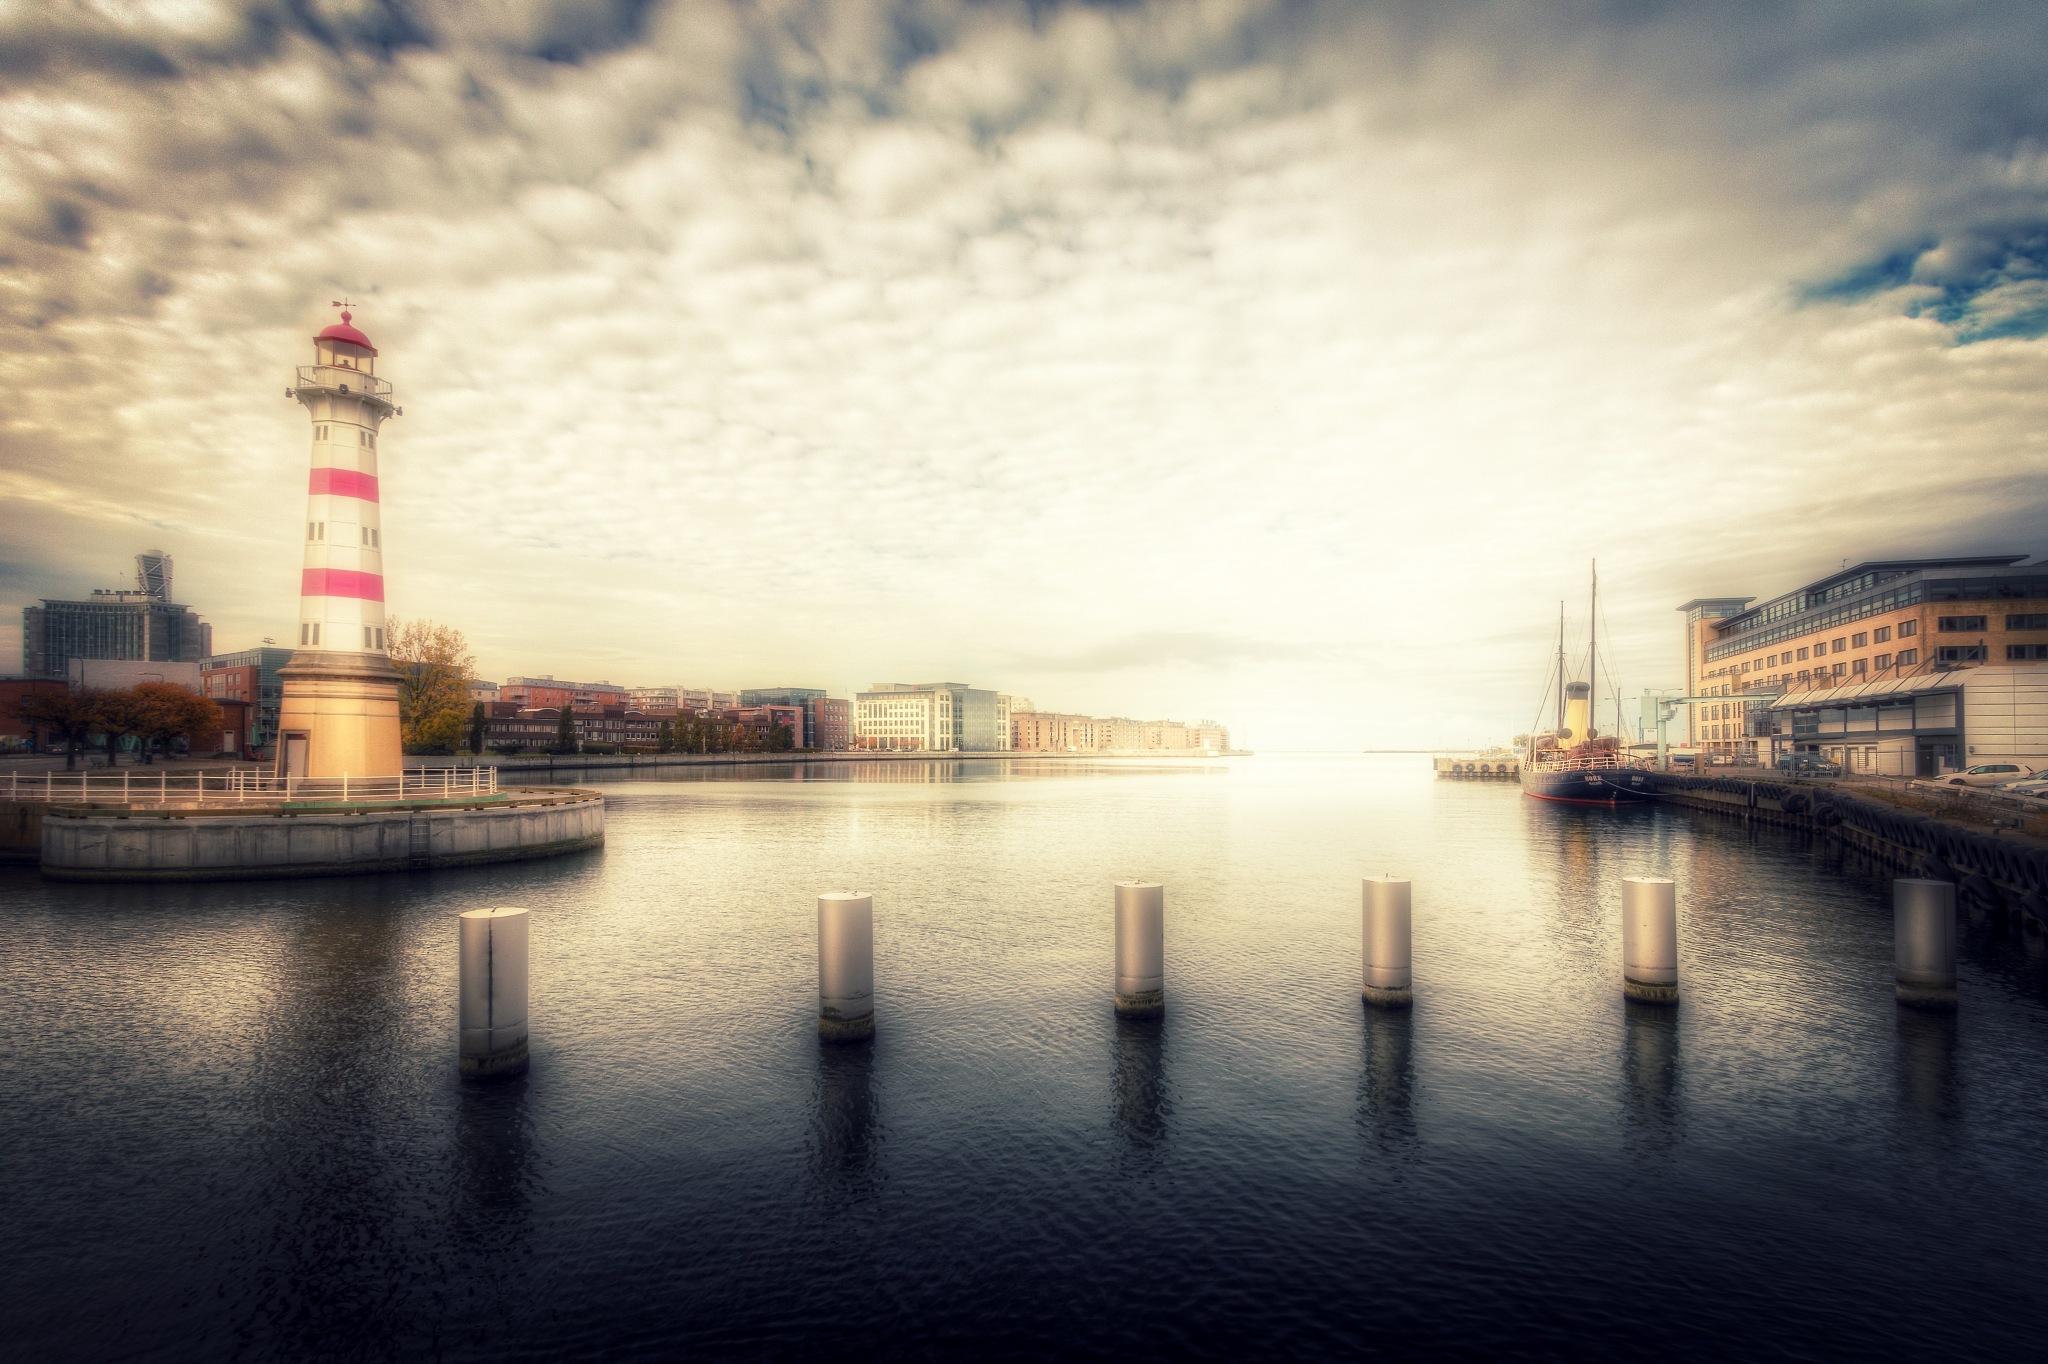 Sea & Clouds by Mirza Buljusmic